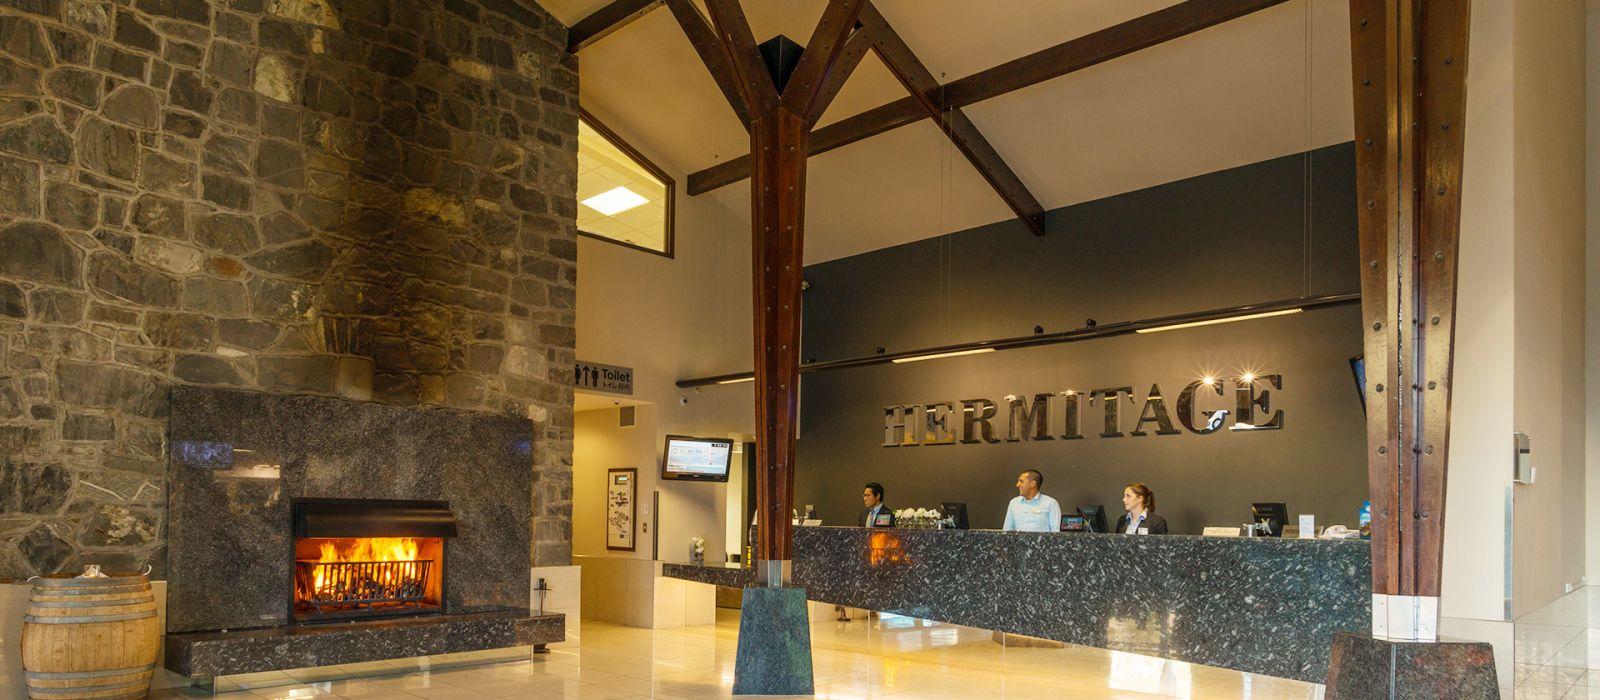 Hotel The Hermitage  New Zealand